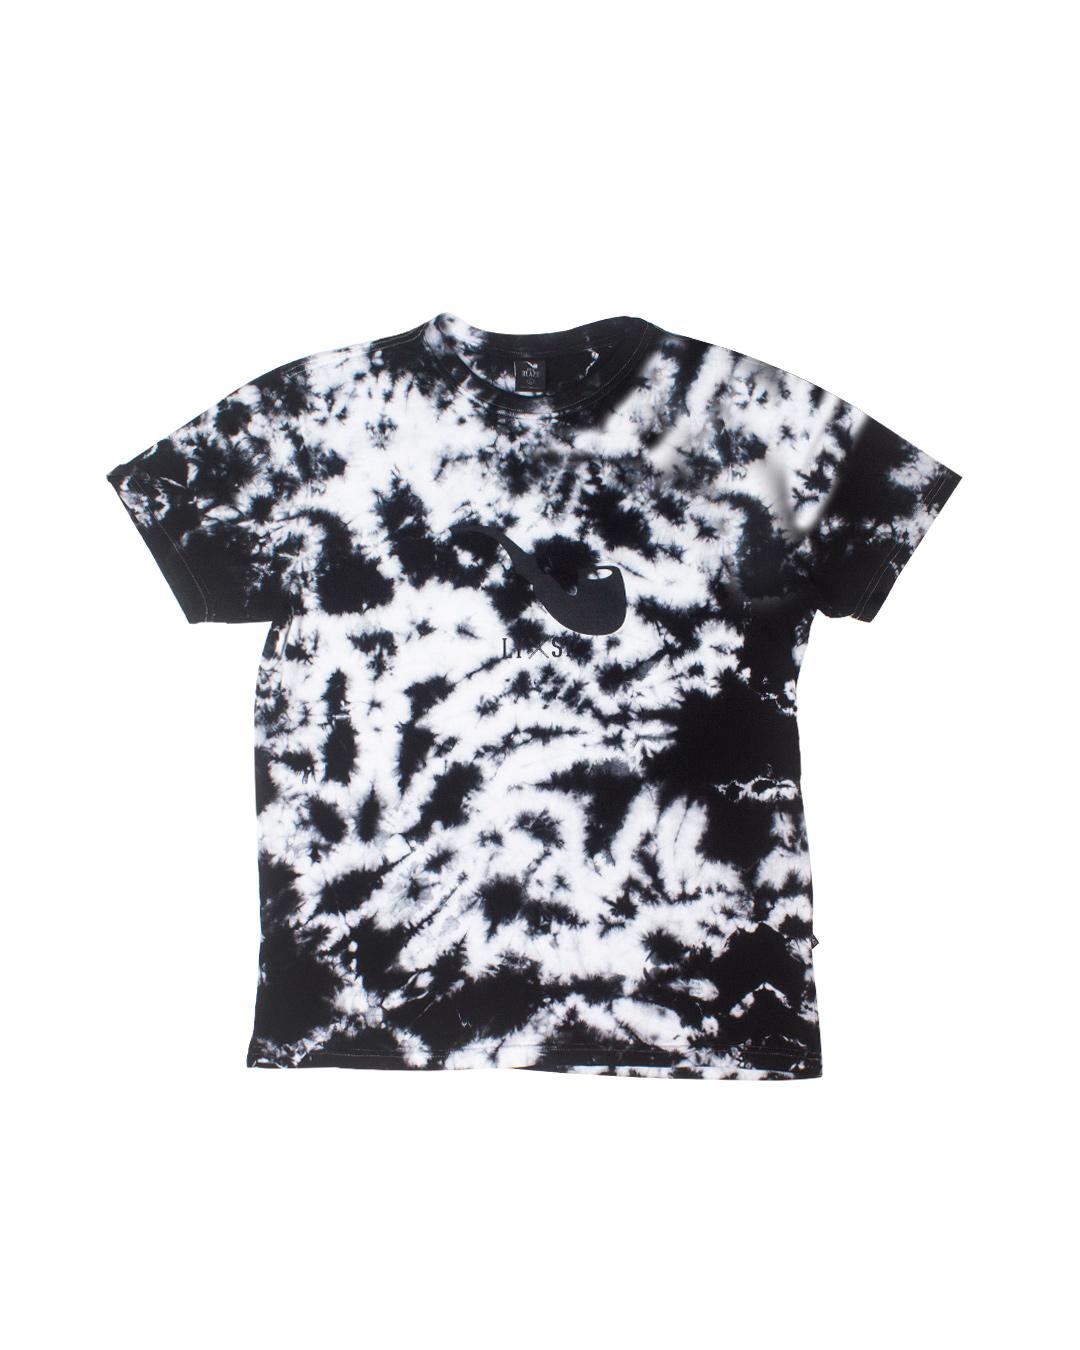 Camiseta Tie Dye Pipe Black Blaze Supply